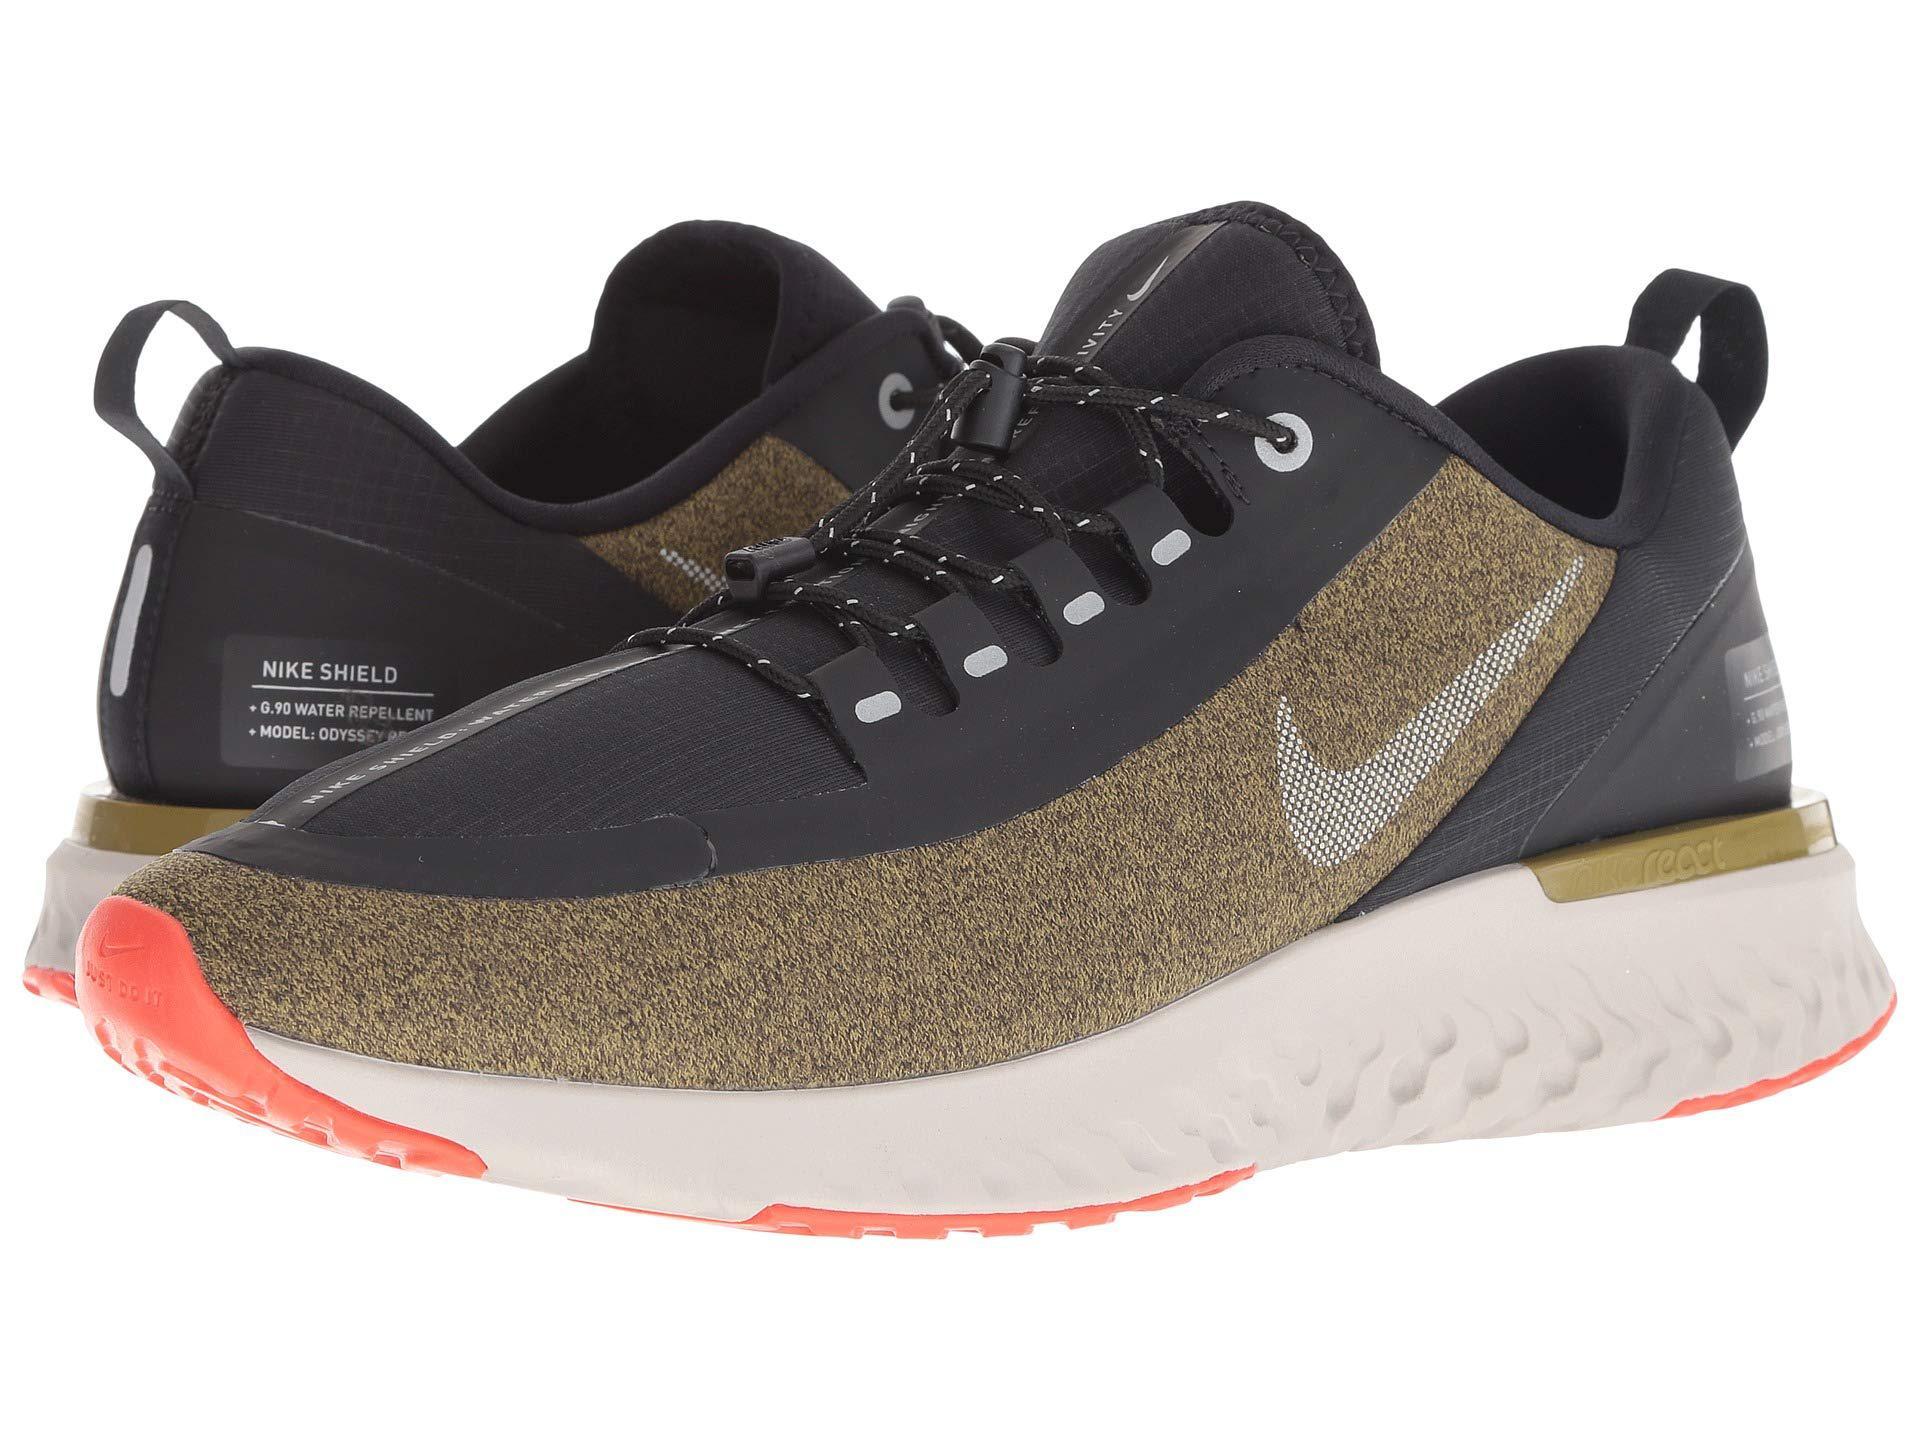 d7787f5b3 Nike Odyssey React Shield (black/anthracite/anthracite/dark Grey ...